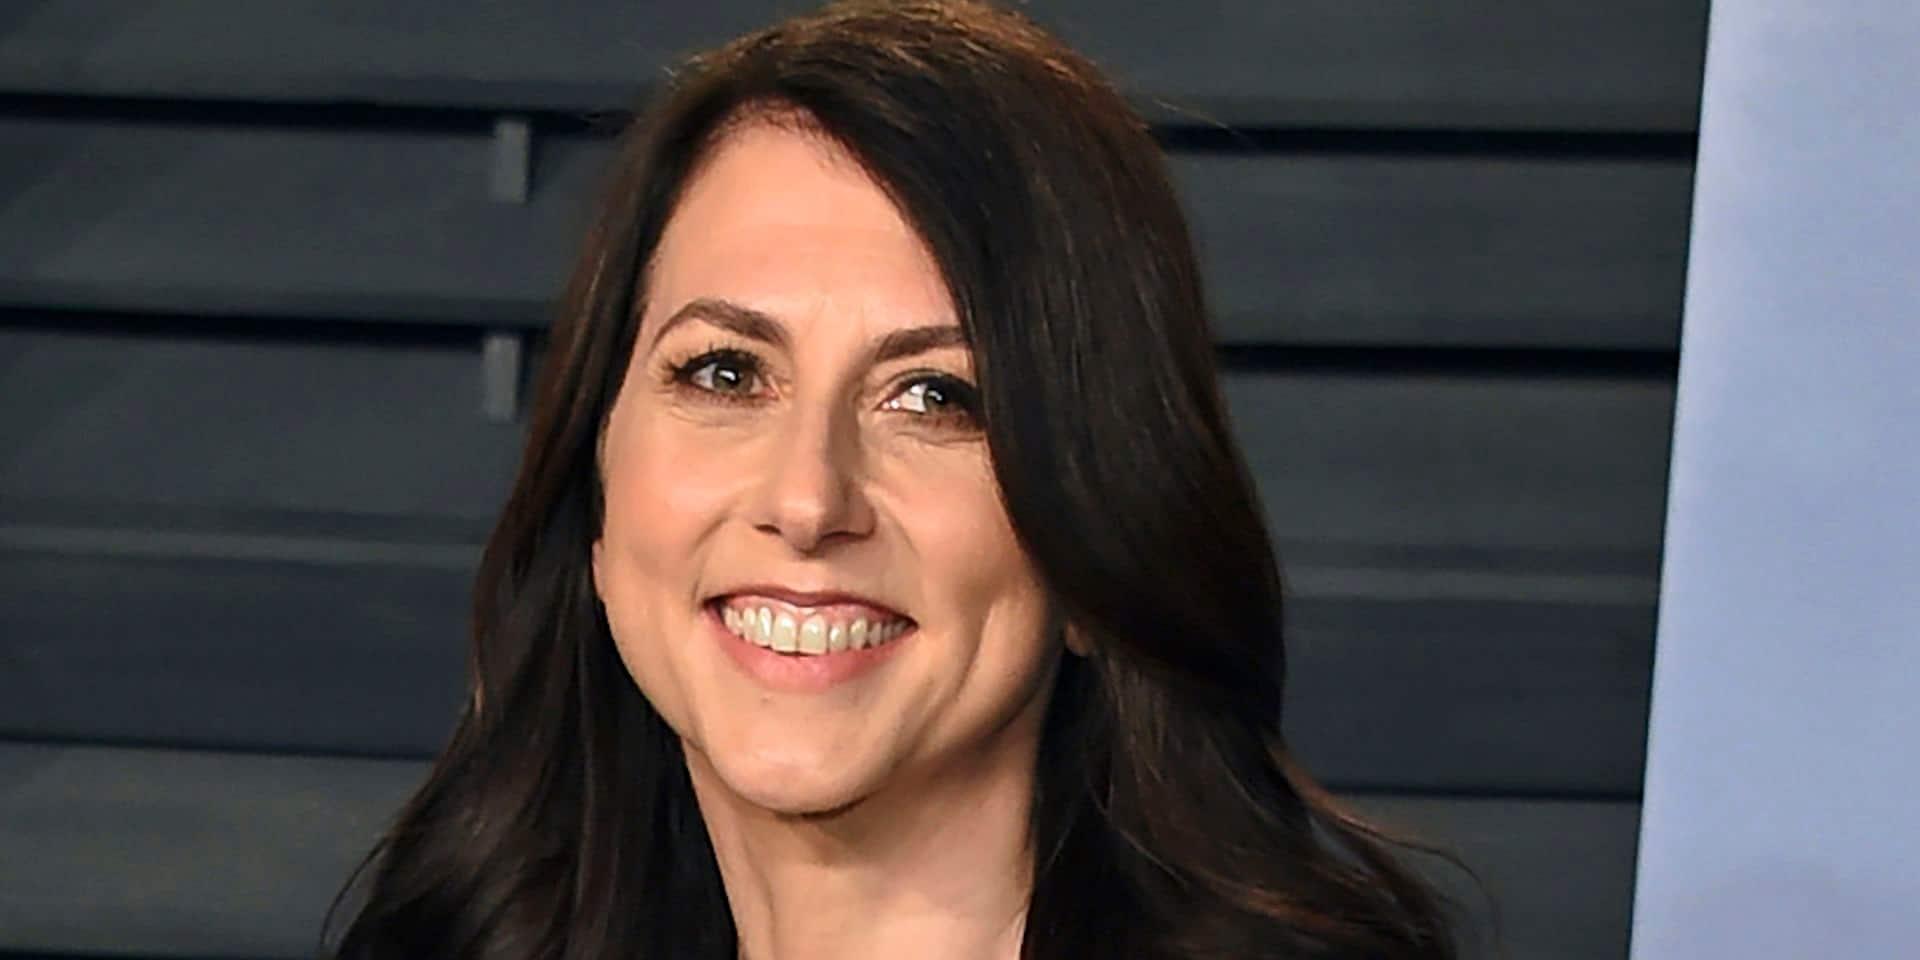 La milliardaire MacKenzie Scott, ex-femme de Jeff Bezos, s'est remariée